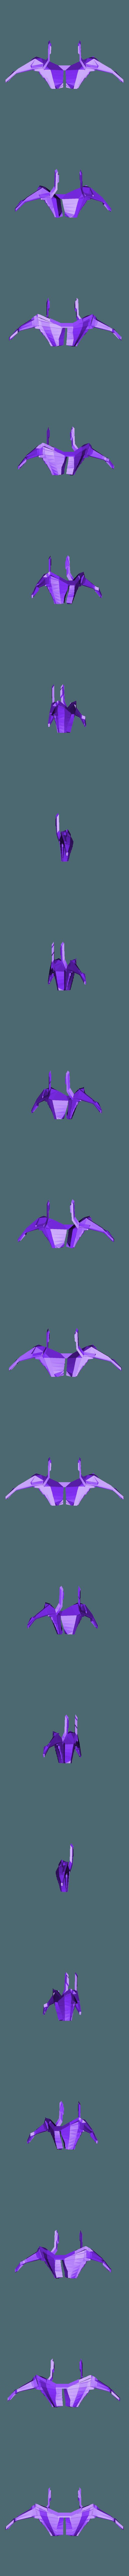 Eagle_Black_Frame.stl Download free STL file Eagle Multi Colour/Material (Elite Dangerous) • 3D print object, Kahnindustries